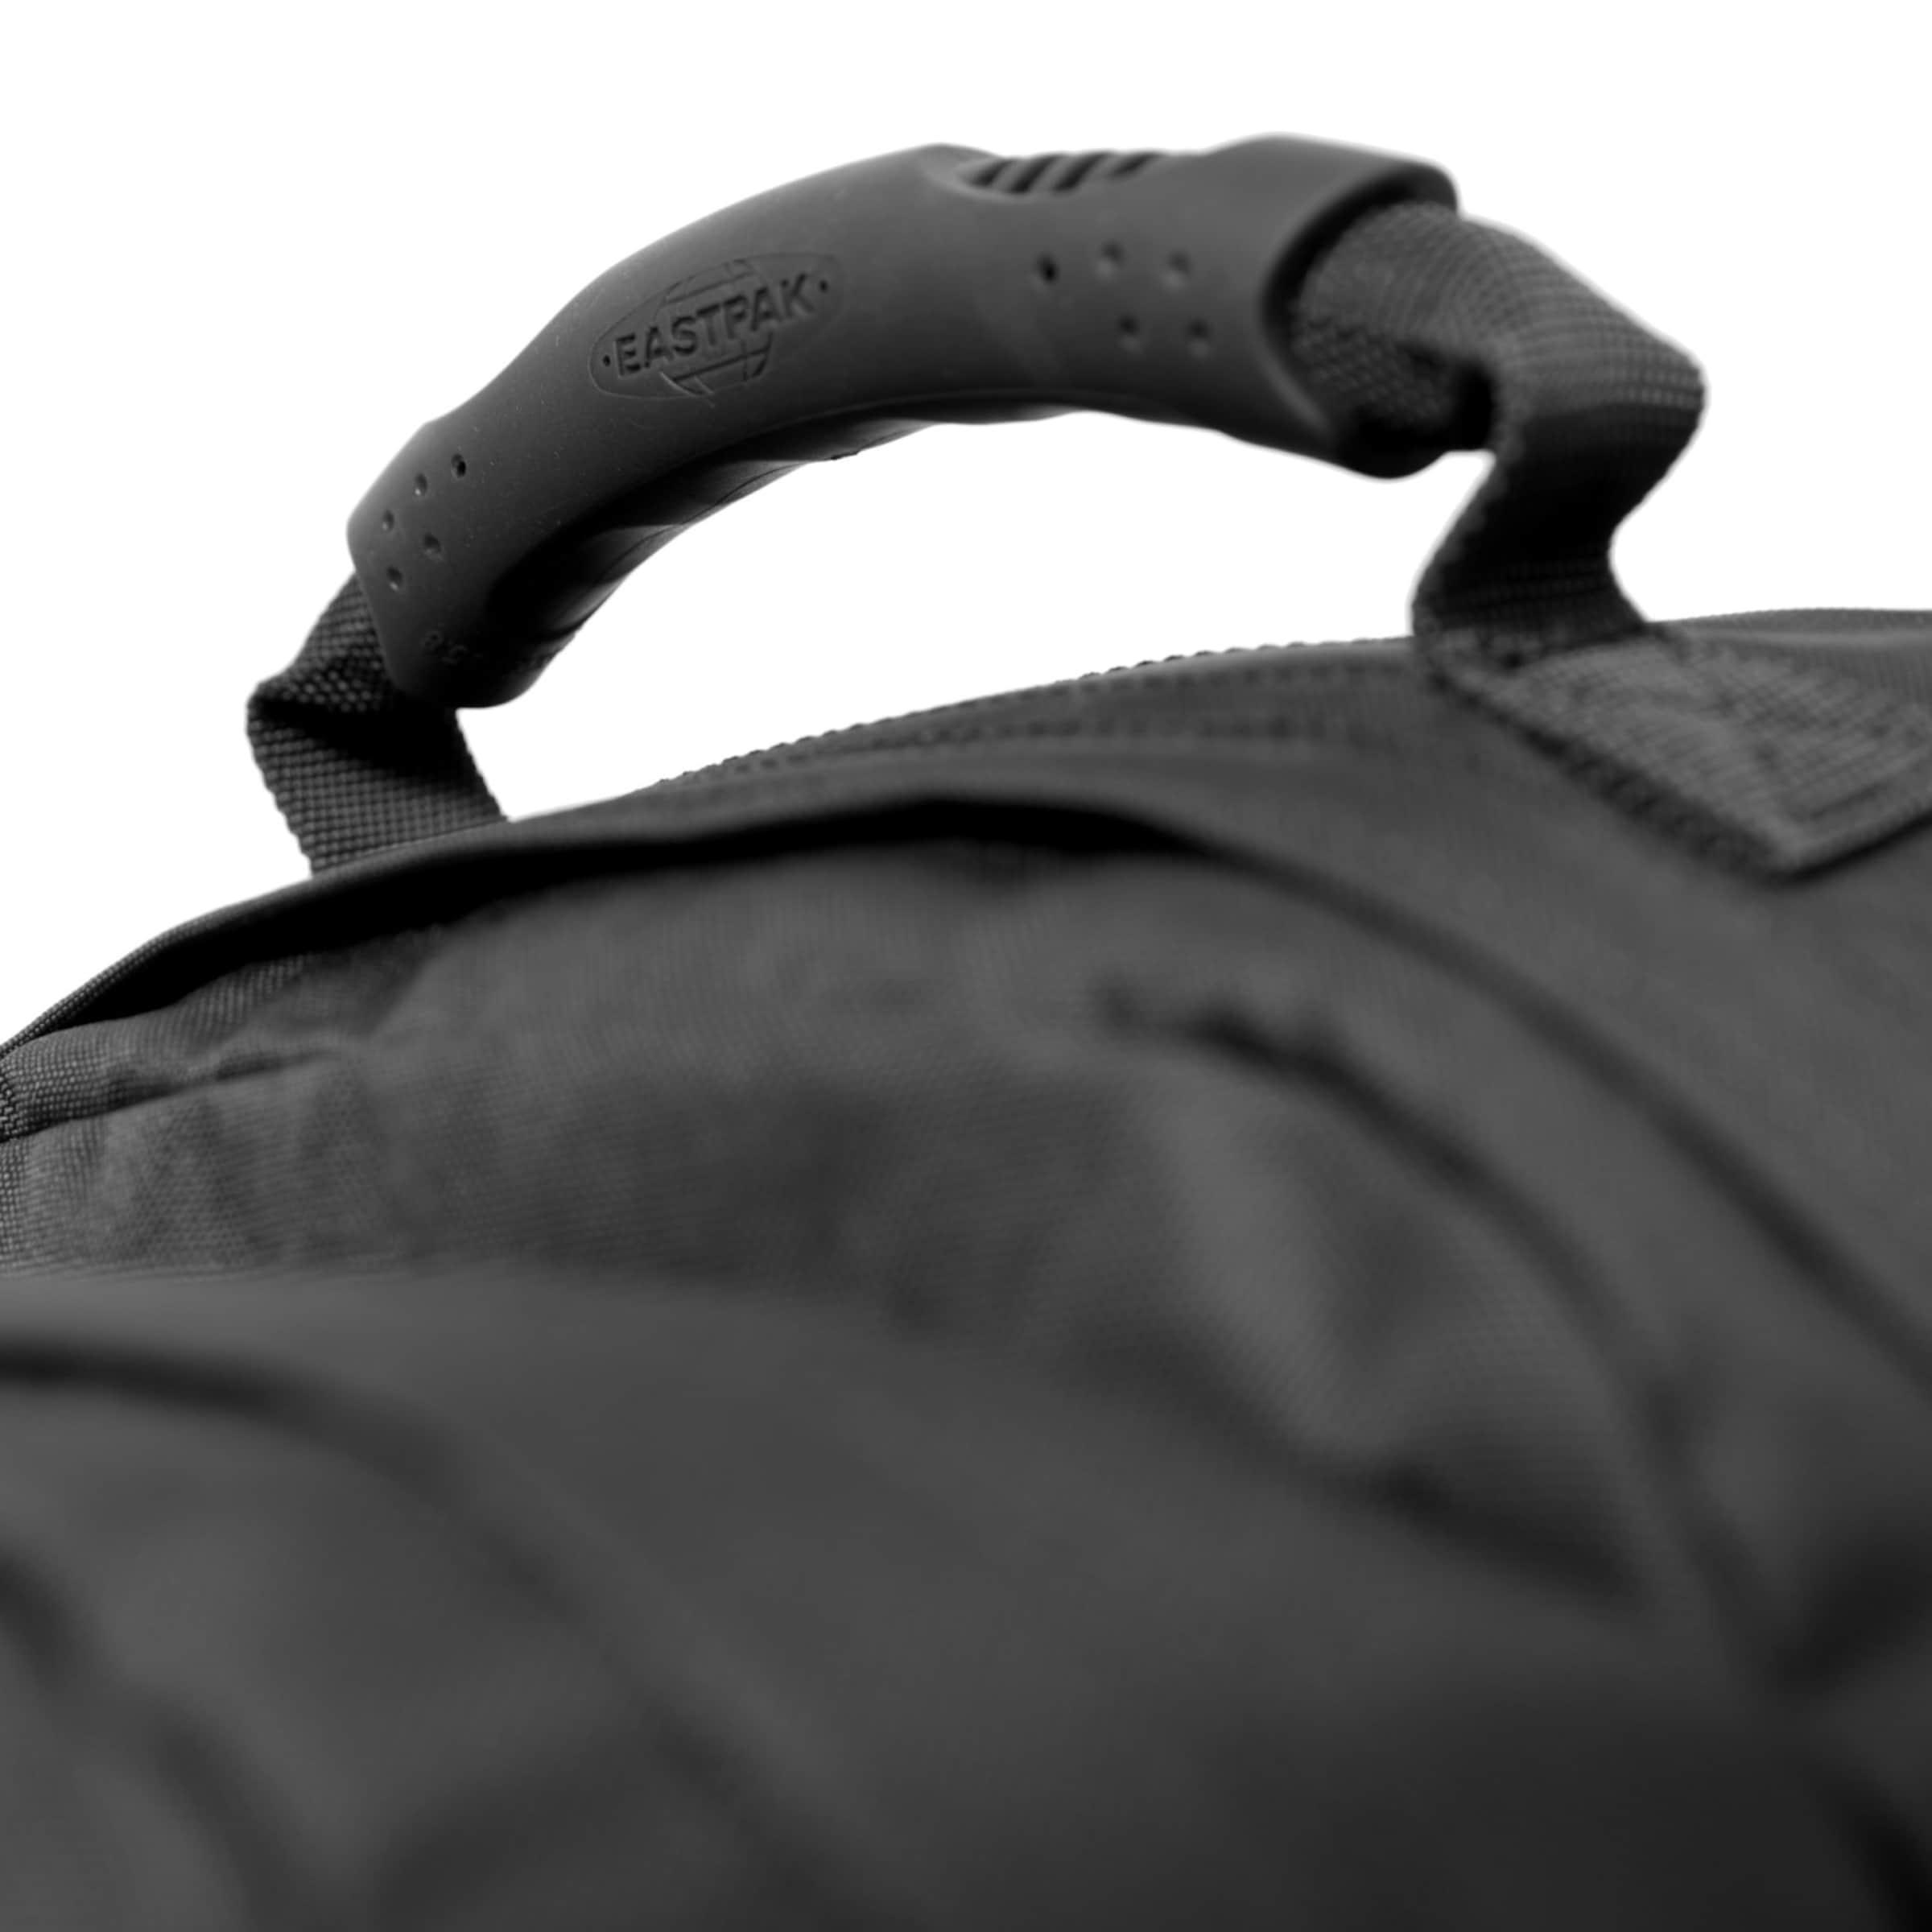 Beliebt Zu Verkaufen Billig EASTPAK 'Provider 16' Rucksack 44 cm WW9hjA